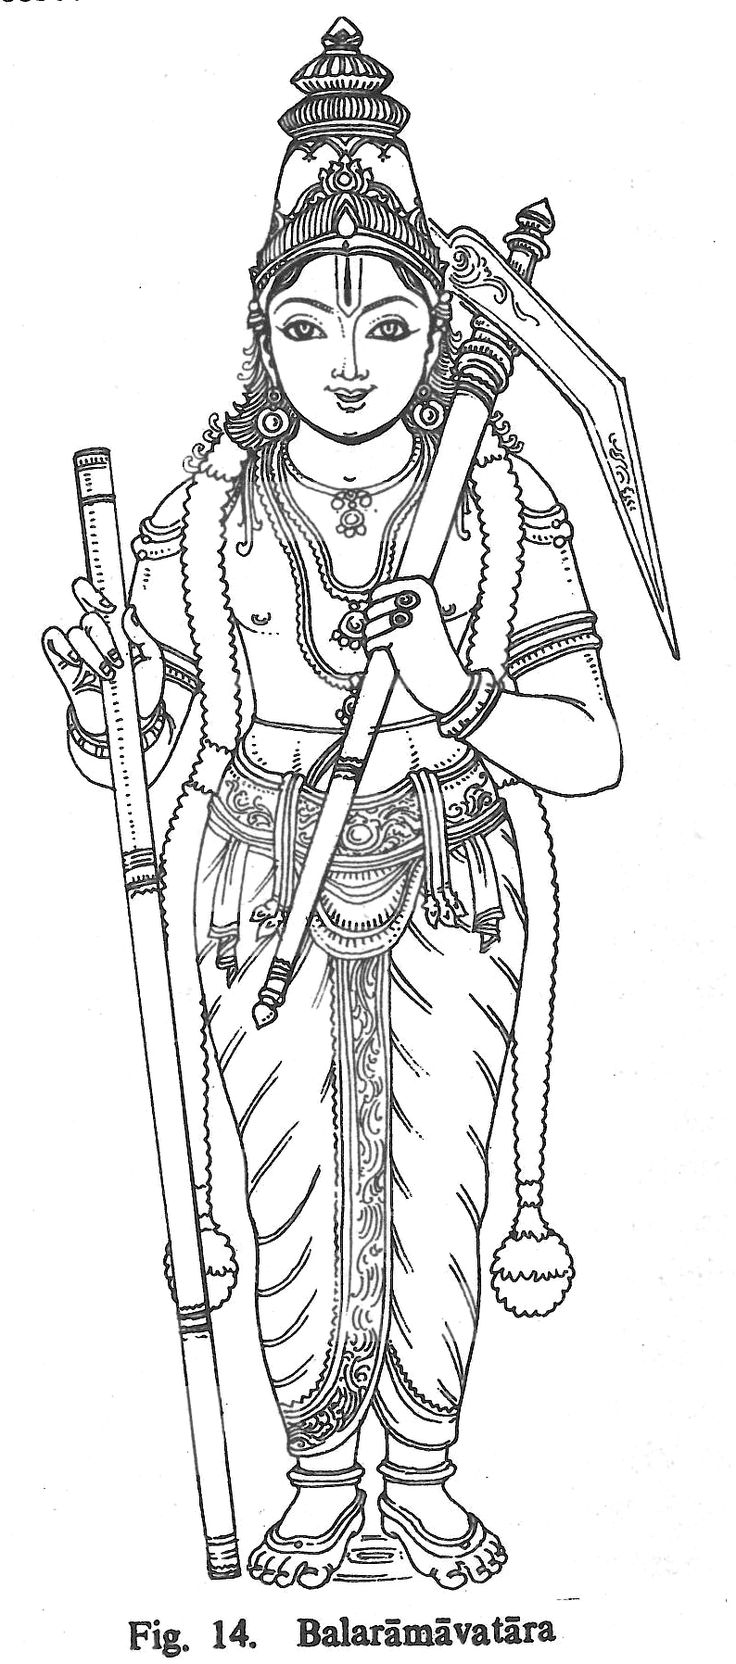 Balaramavatara